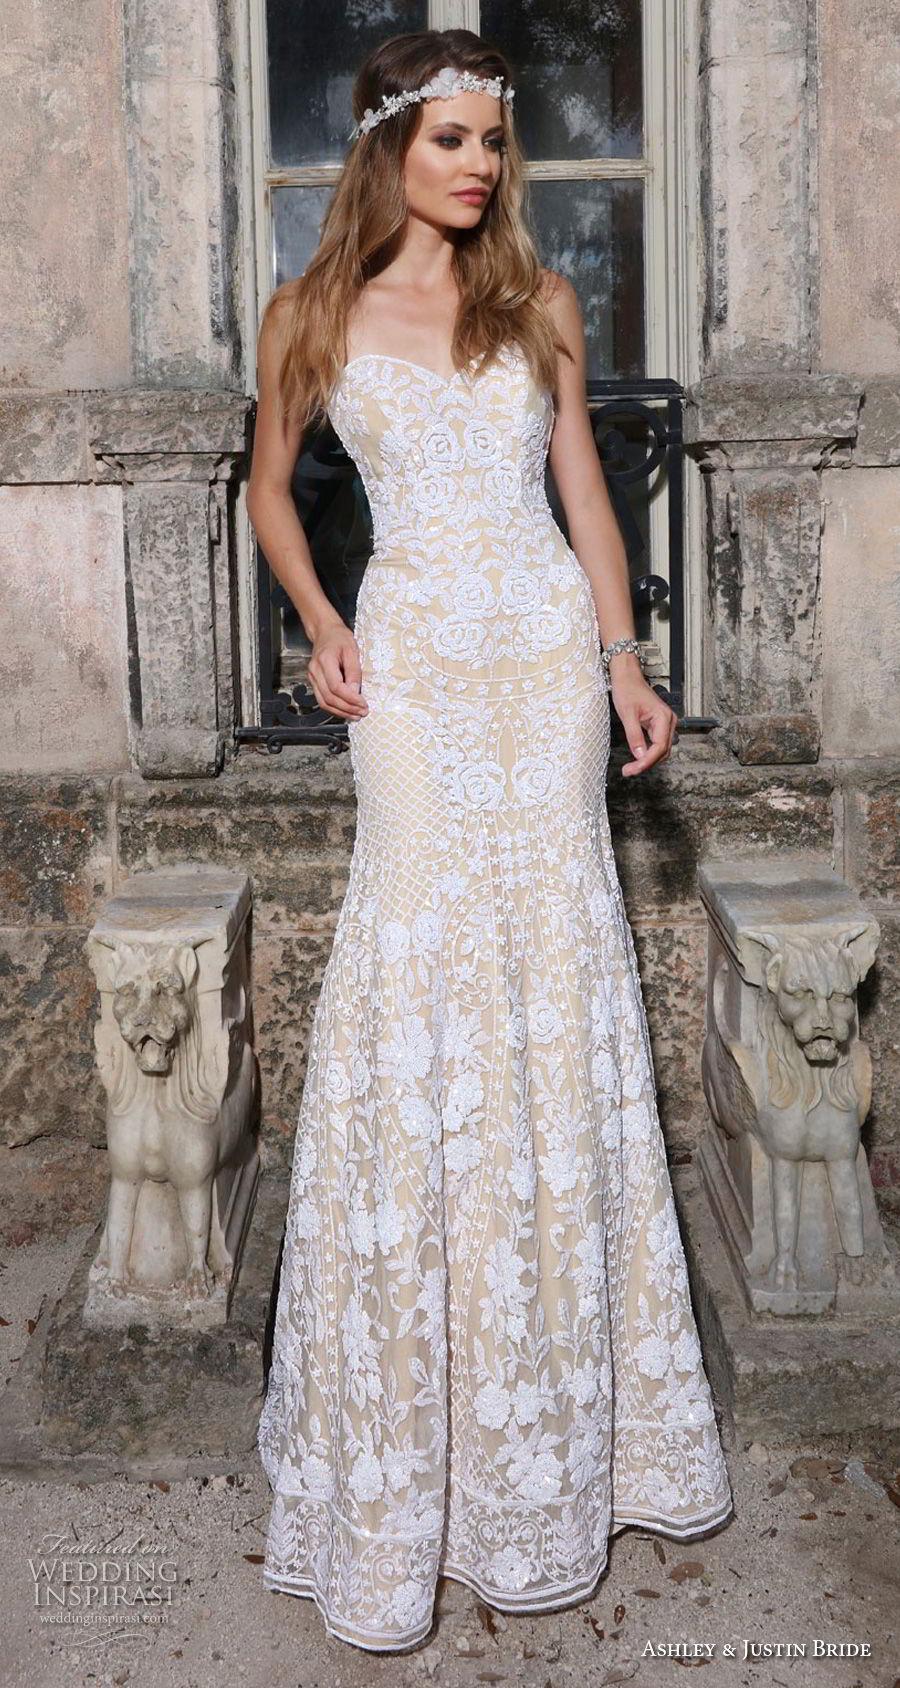 ashley justin spring 2018 bridal strapless sweetheart neckline full embellishment romantic ivory color sheath wedding dress short train (19) mv